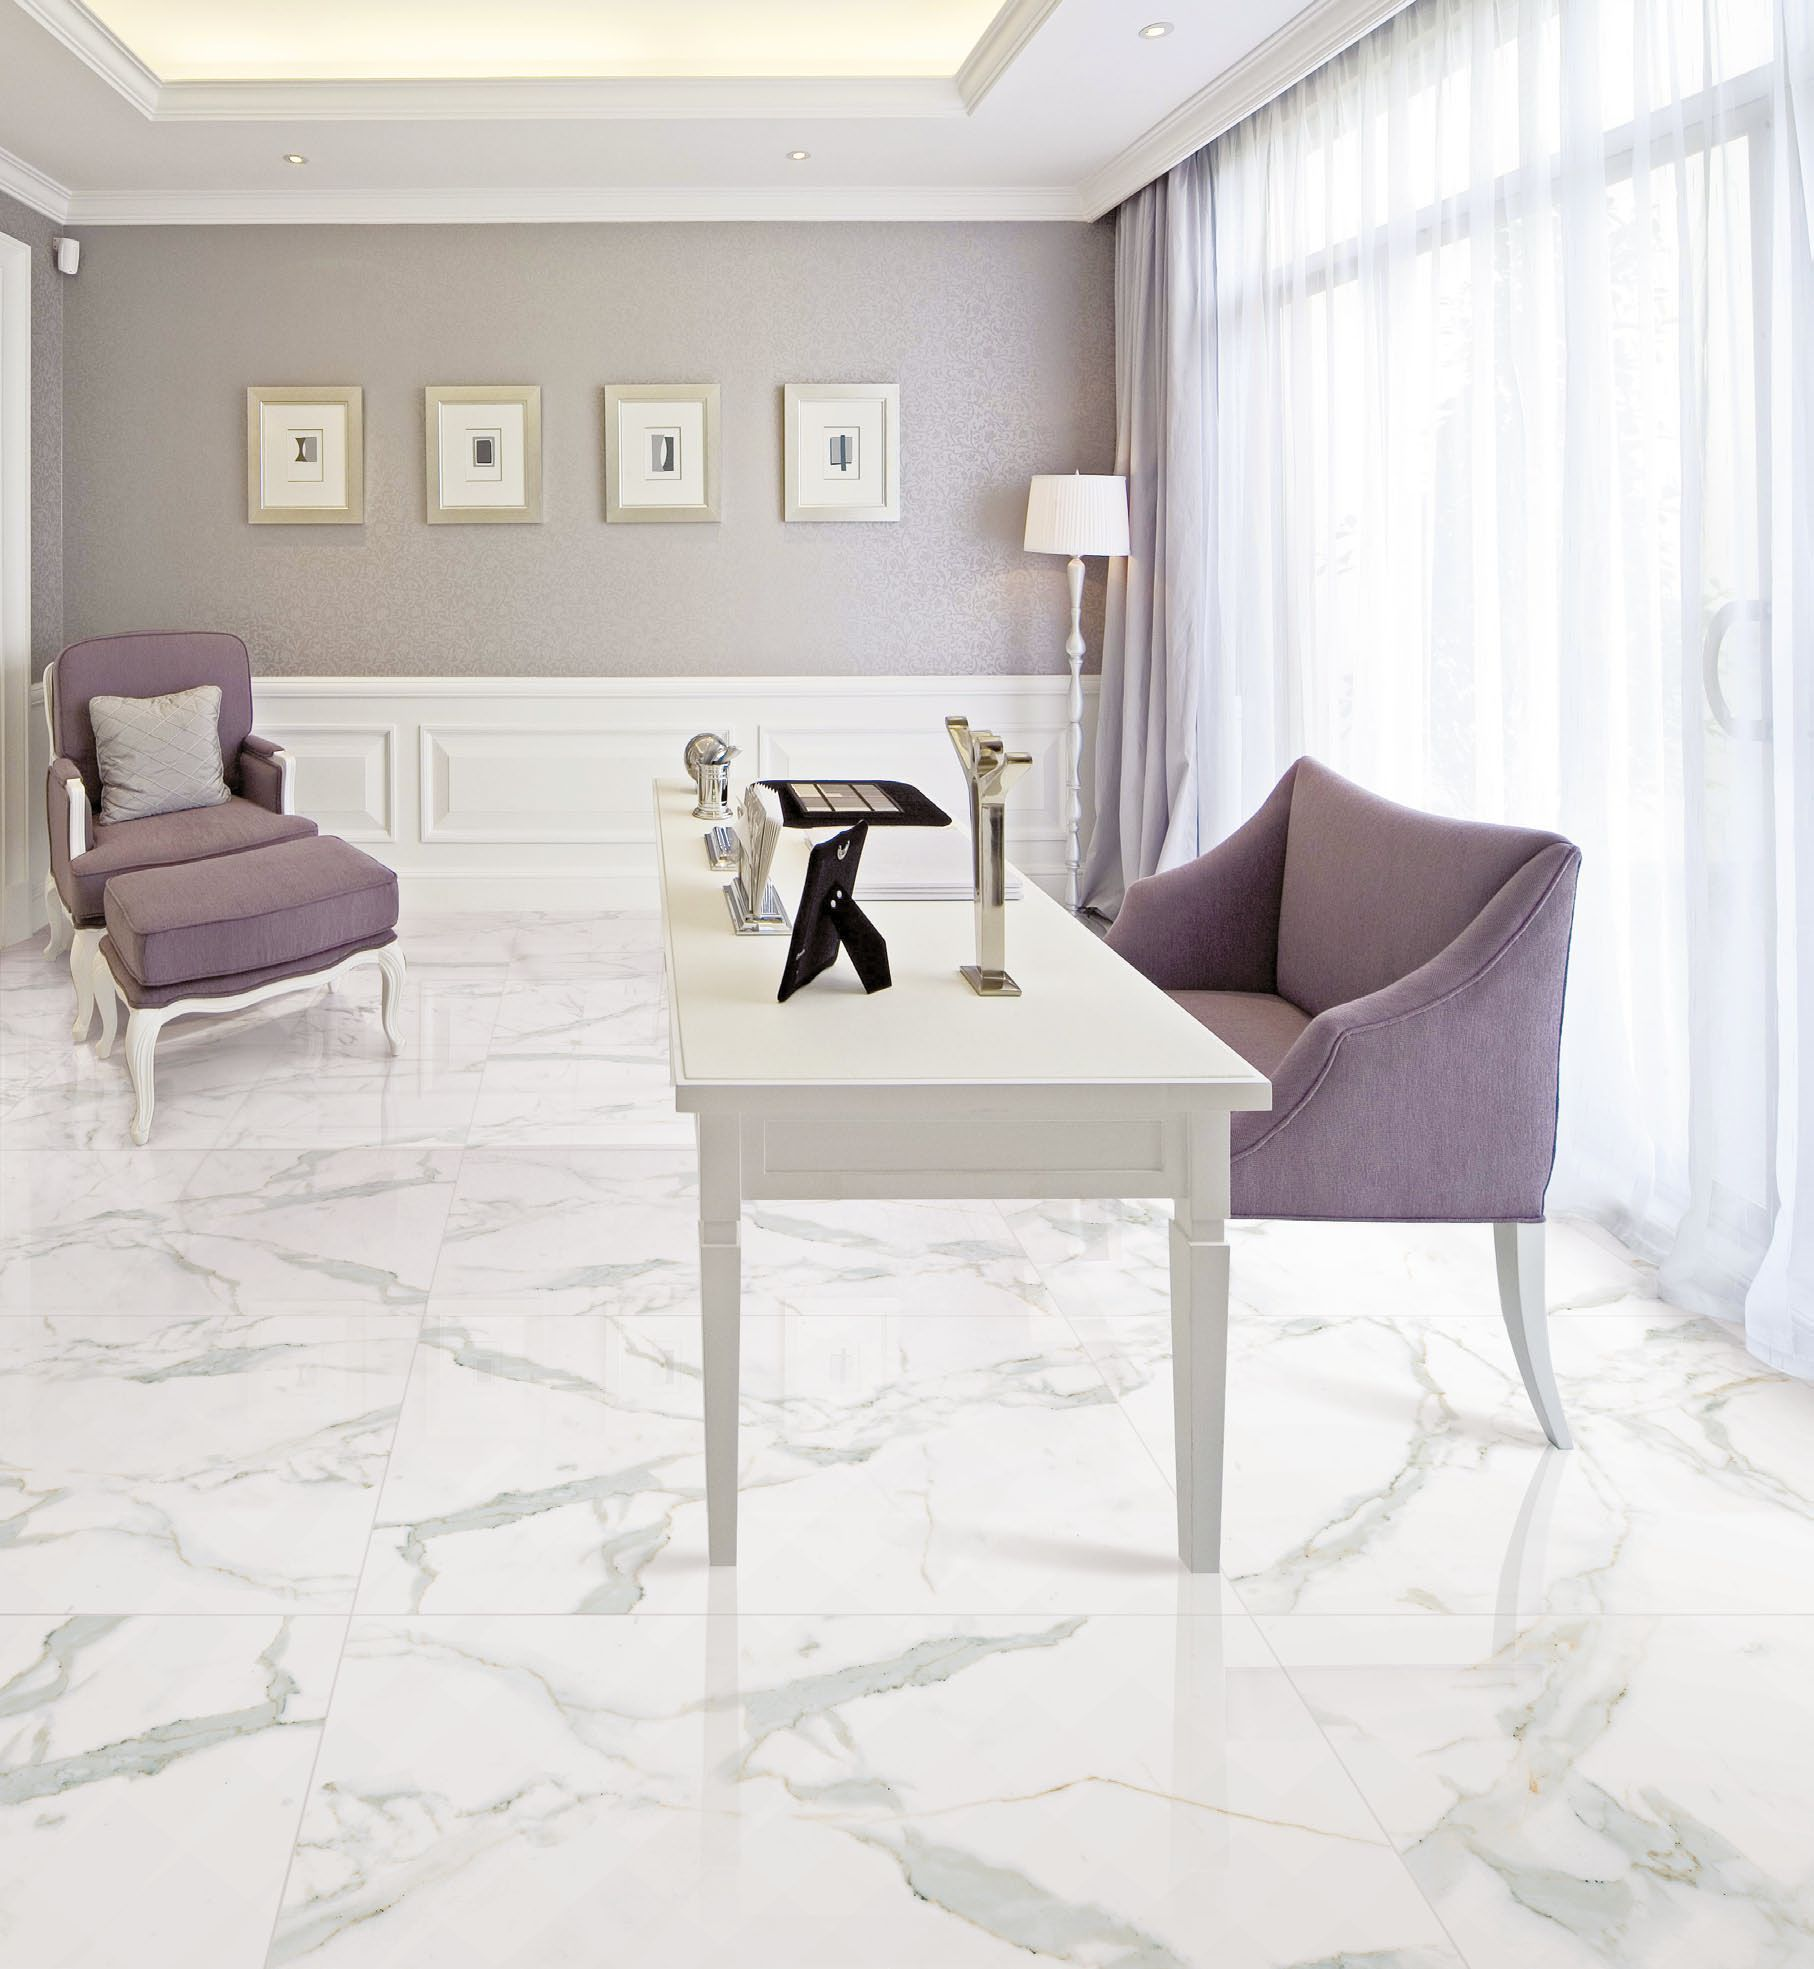 Marble look calacatta gold 24x24 pnfcanada marble look marble look calacatta gold 24x24 pnfcanada ceramic floor tilesporcelain dailygadgetfo Gallery